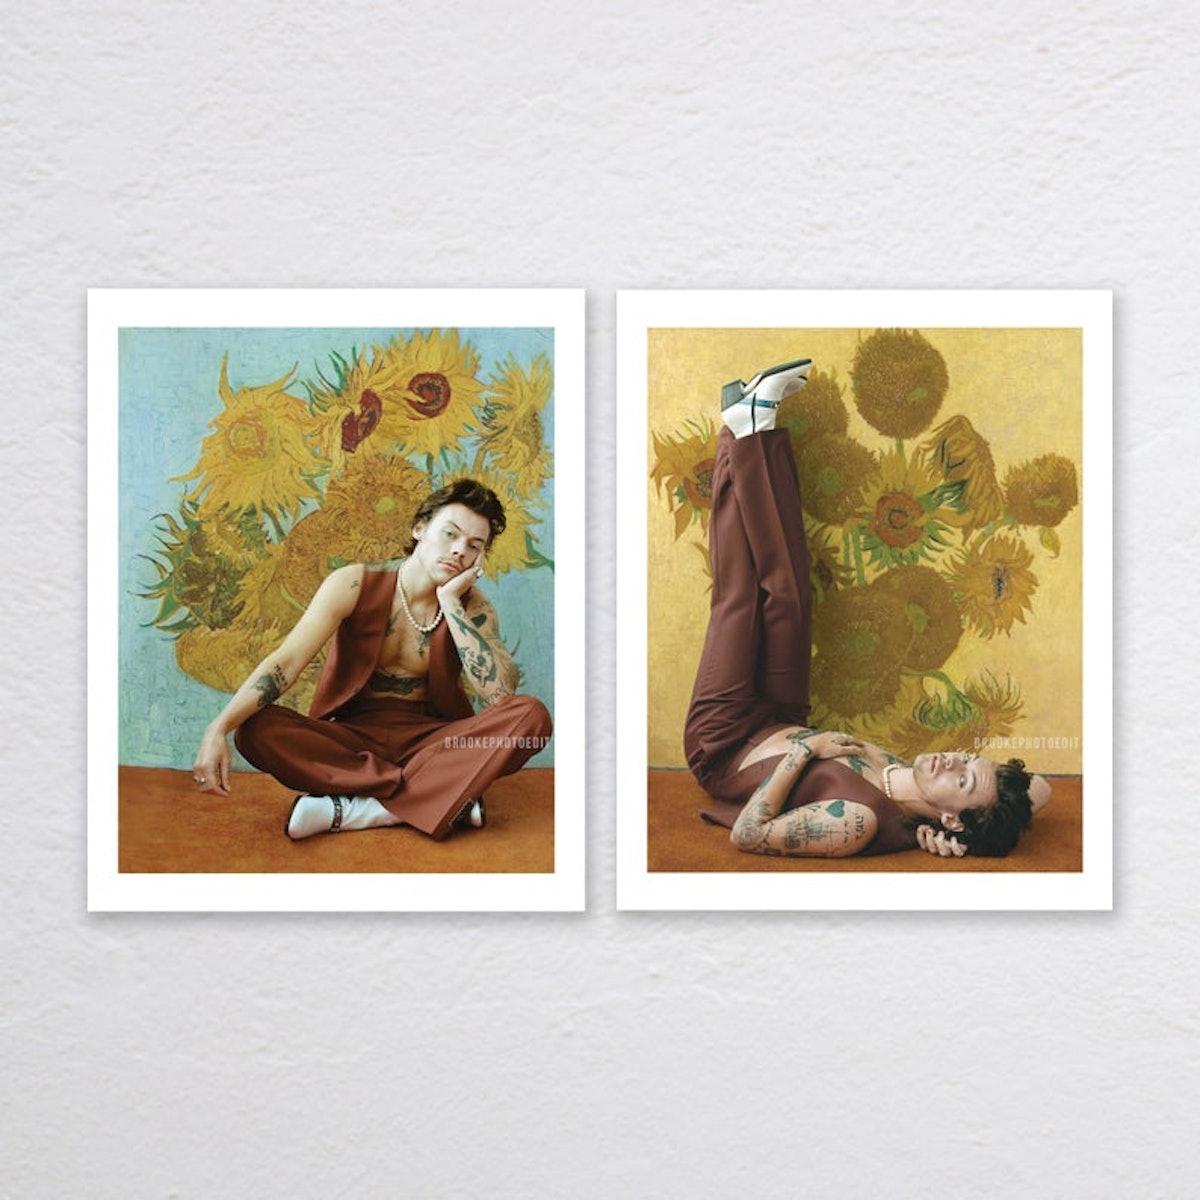 Harry Styles Sunflower Print / Poster